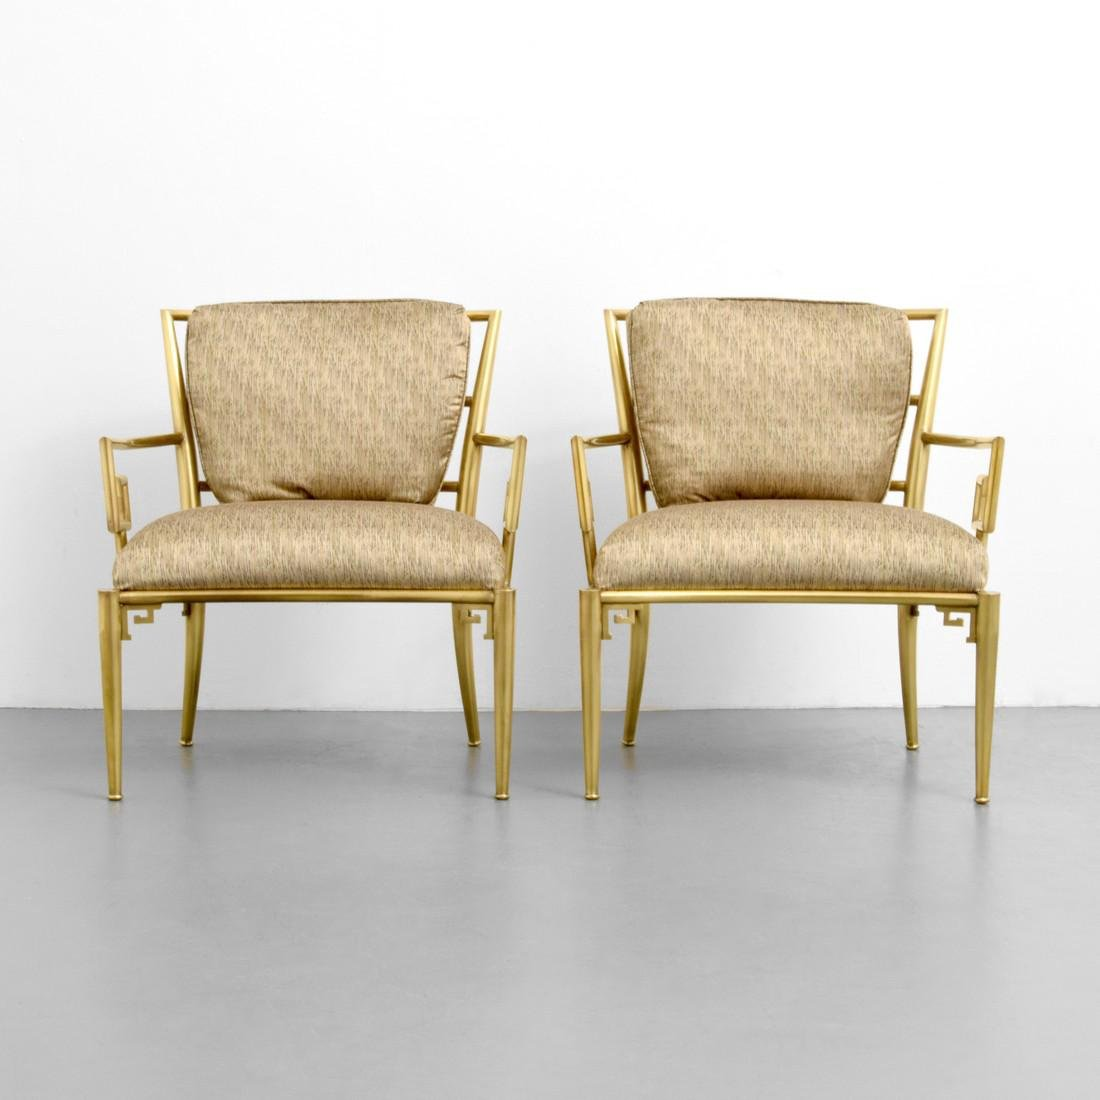 Greek Key Lounge Chairs, Attributed to Mastercraft - 3